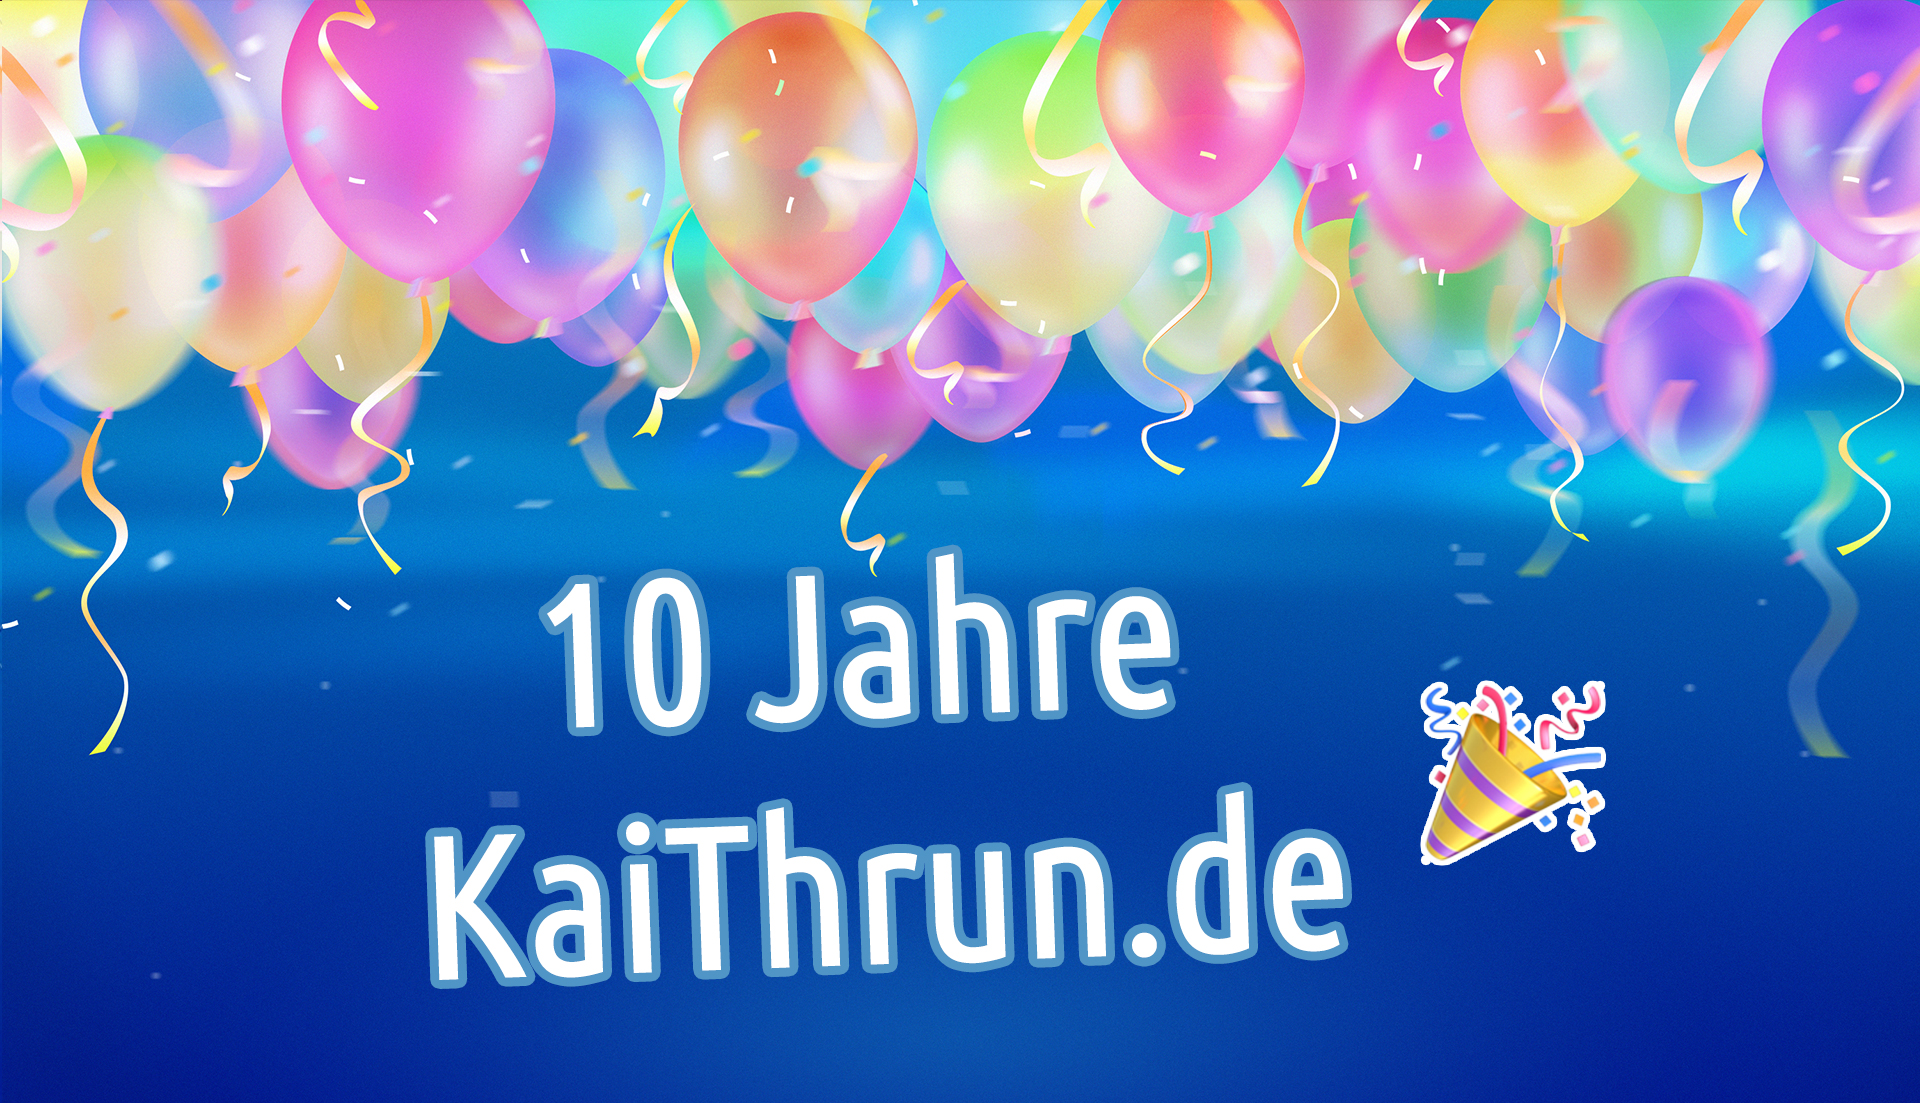 10 Jahre KaiThrun.de